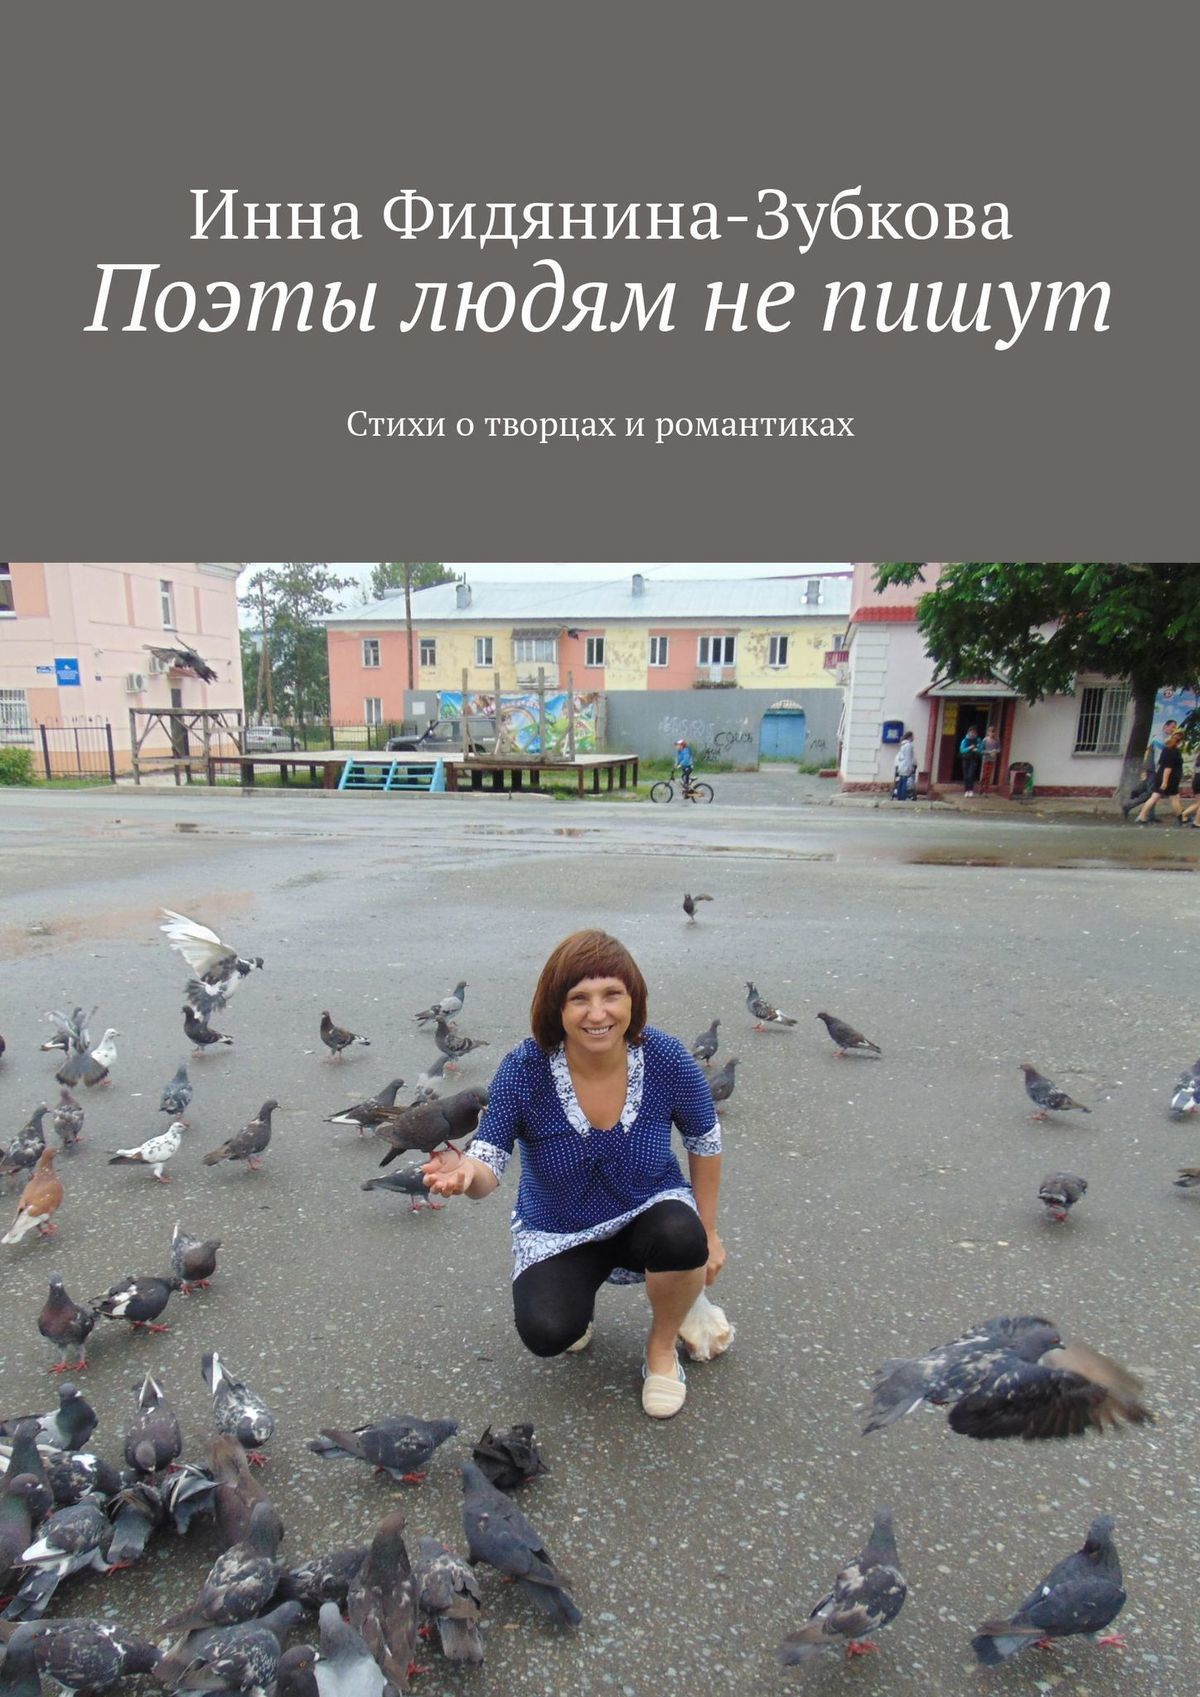 Инна Фидянина-Зубкова Поэты людям непишут. Стихи о творцах иромантиках